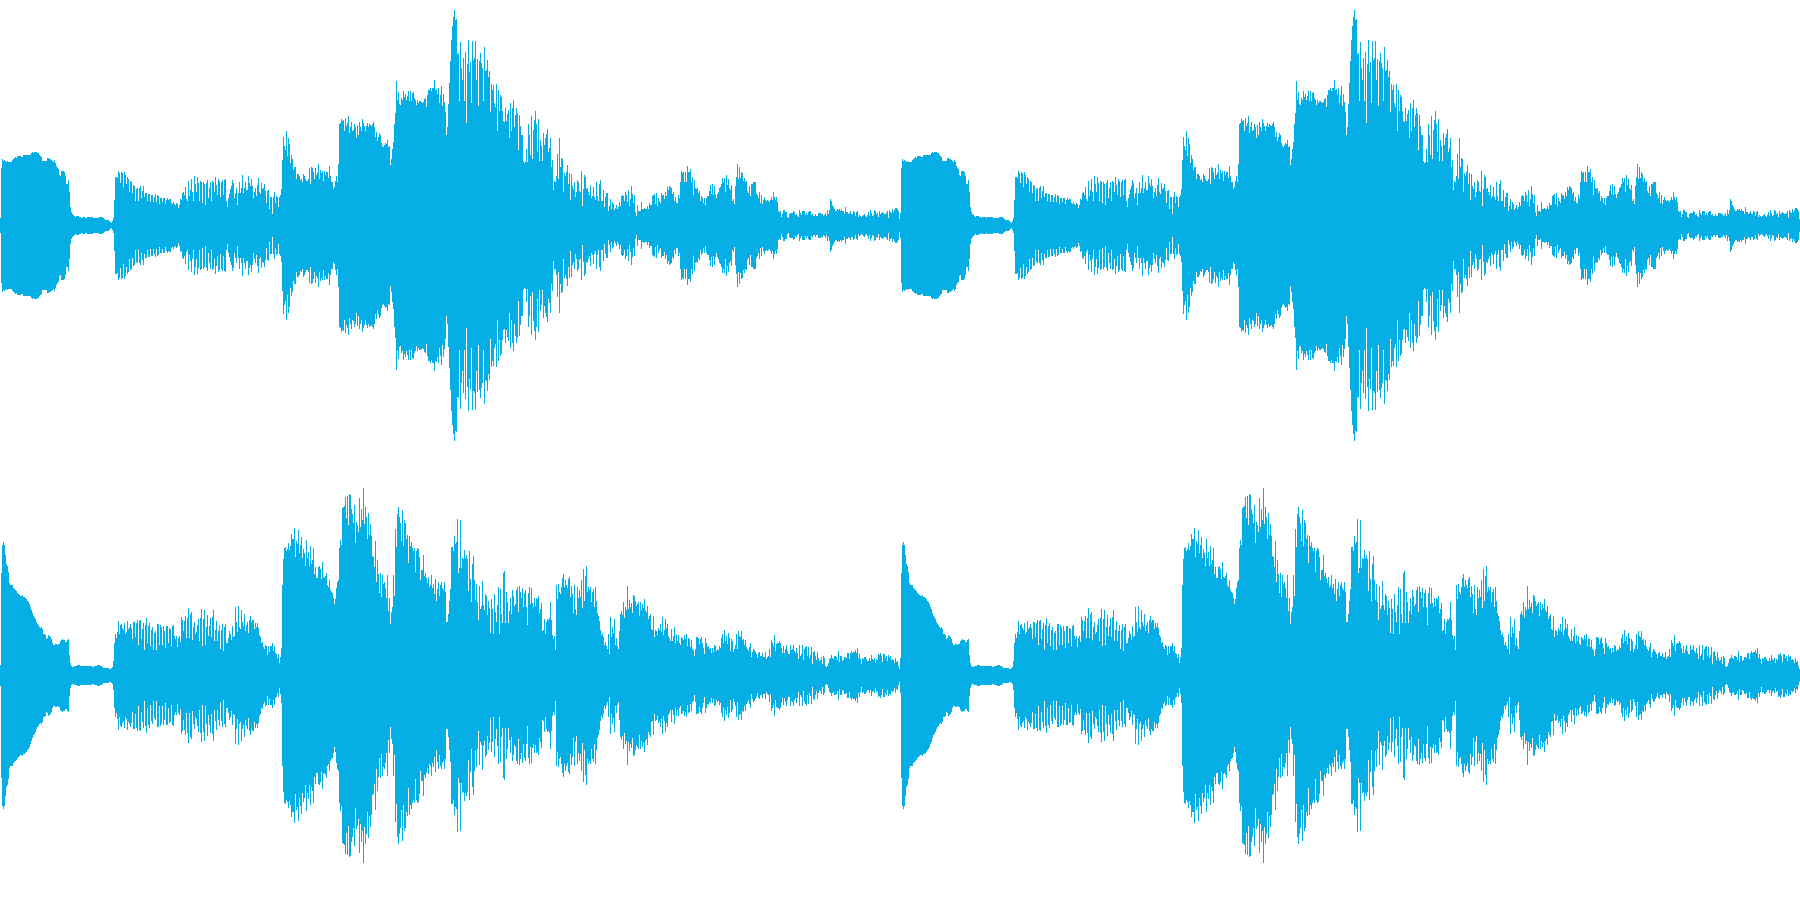 k014 アラーム音(ループ仕様)の再生済みの波形